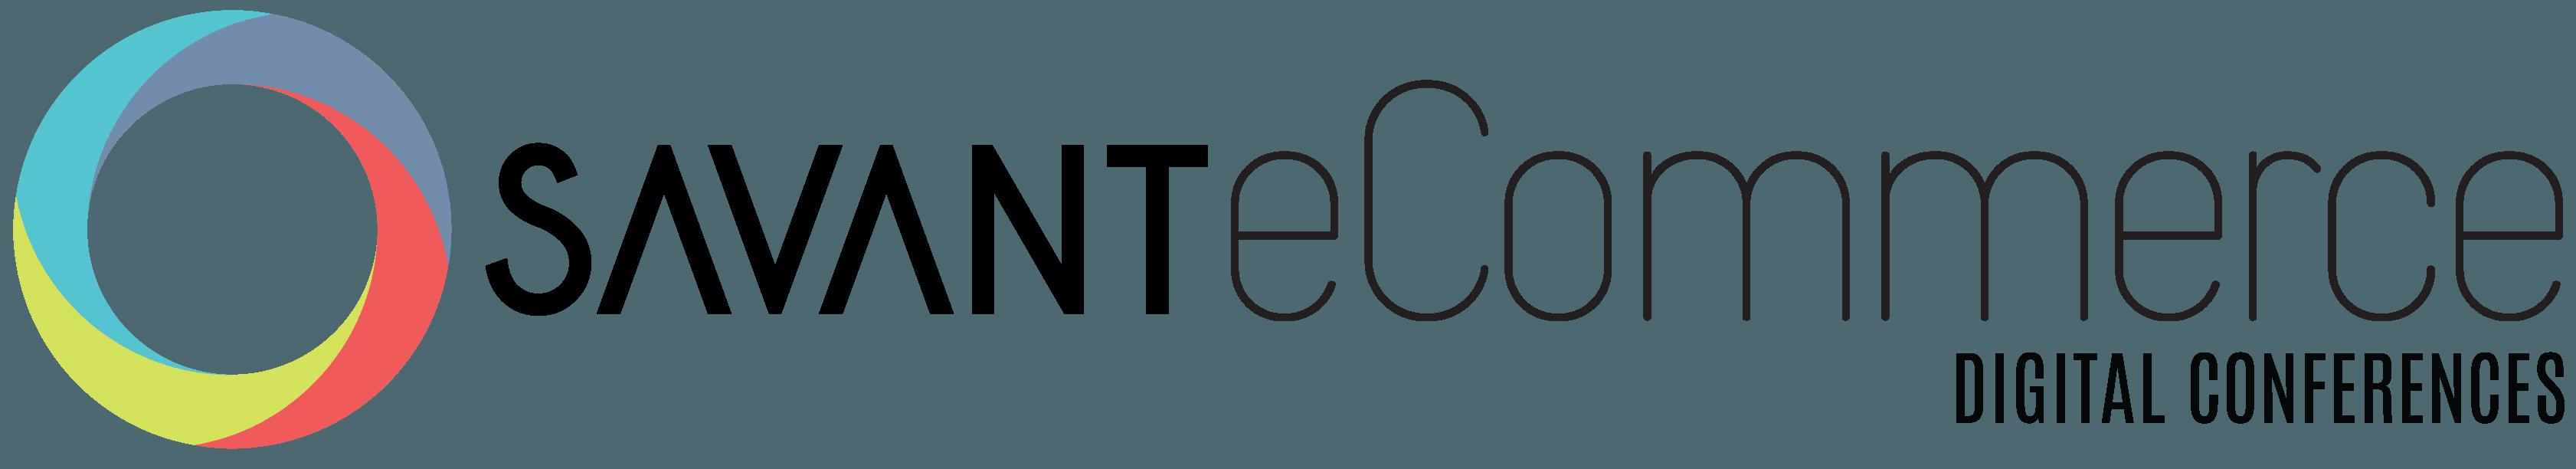 Savant-logo-ecommerce--digital